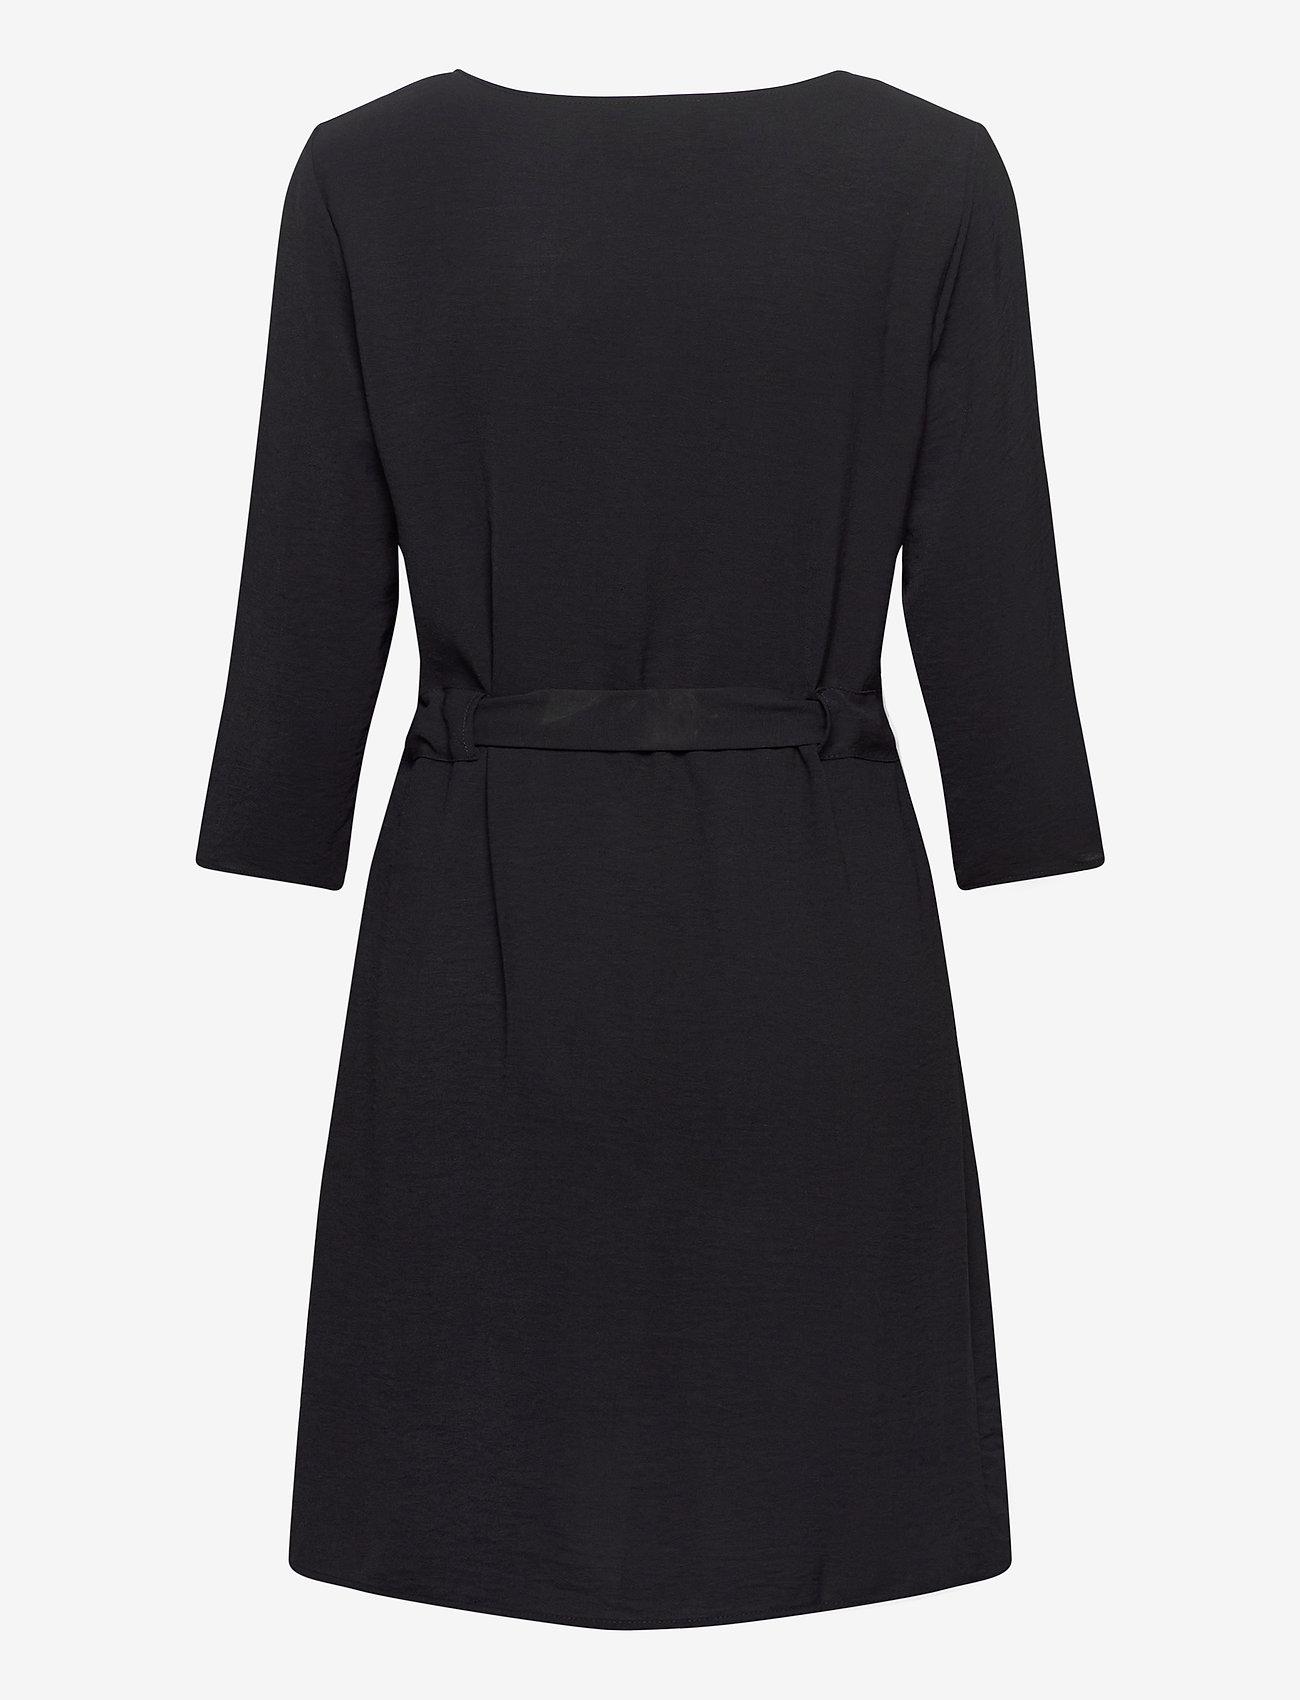 Vila - VIRASHA 3/4 DRESS - midi dresses - black - 1